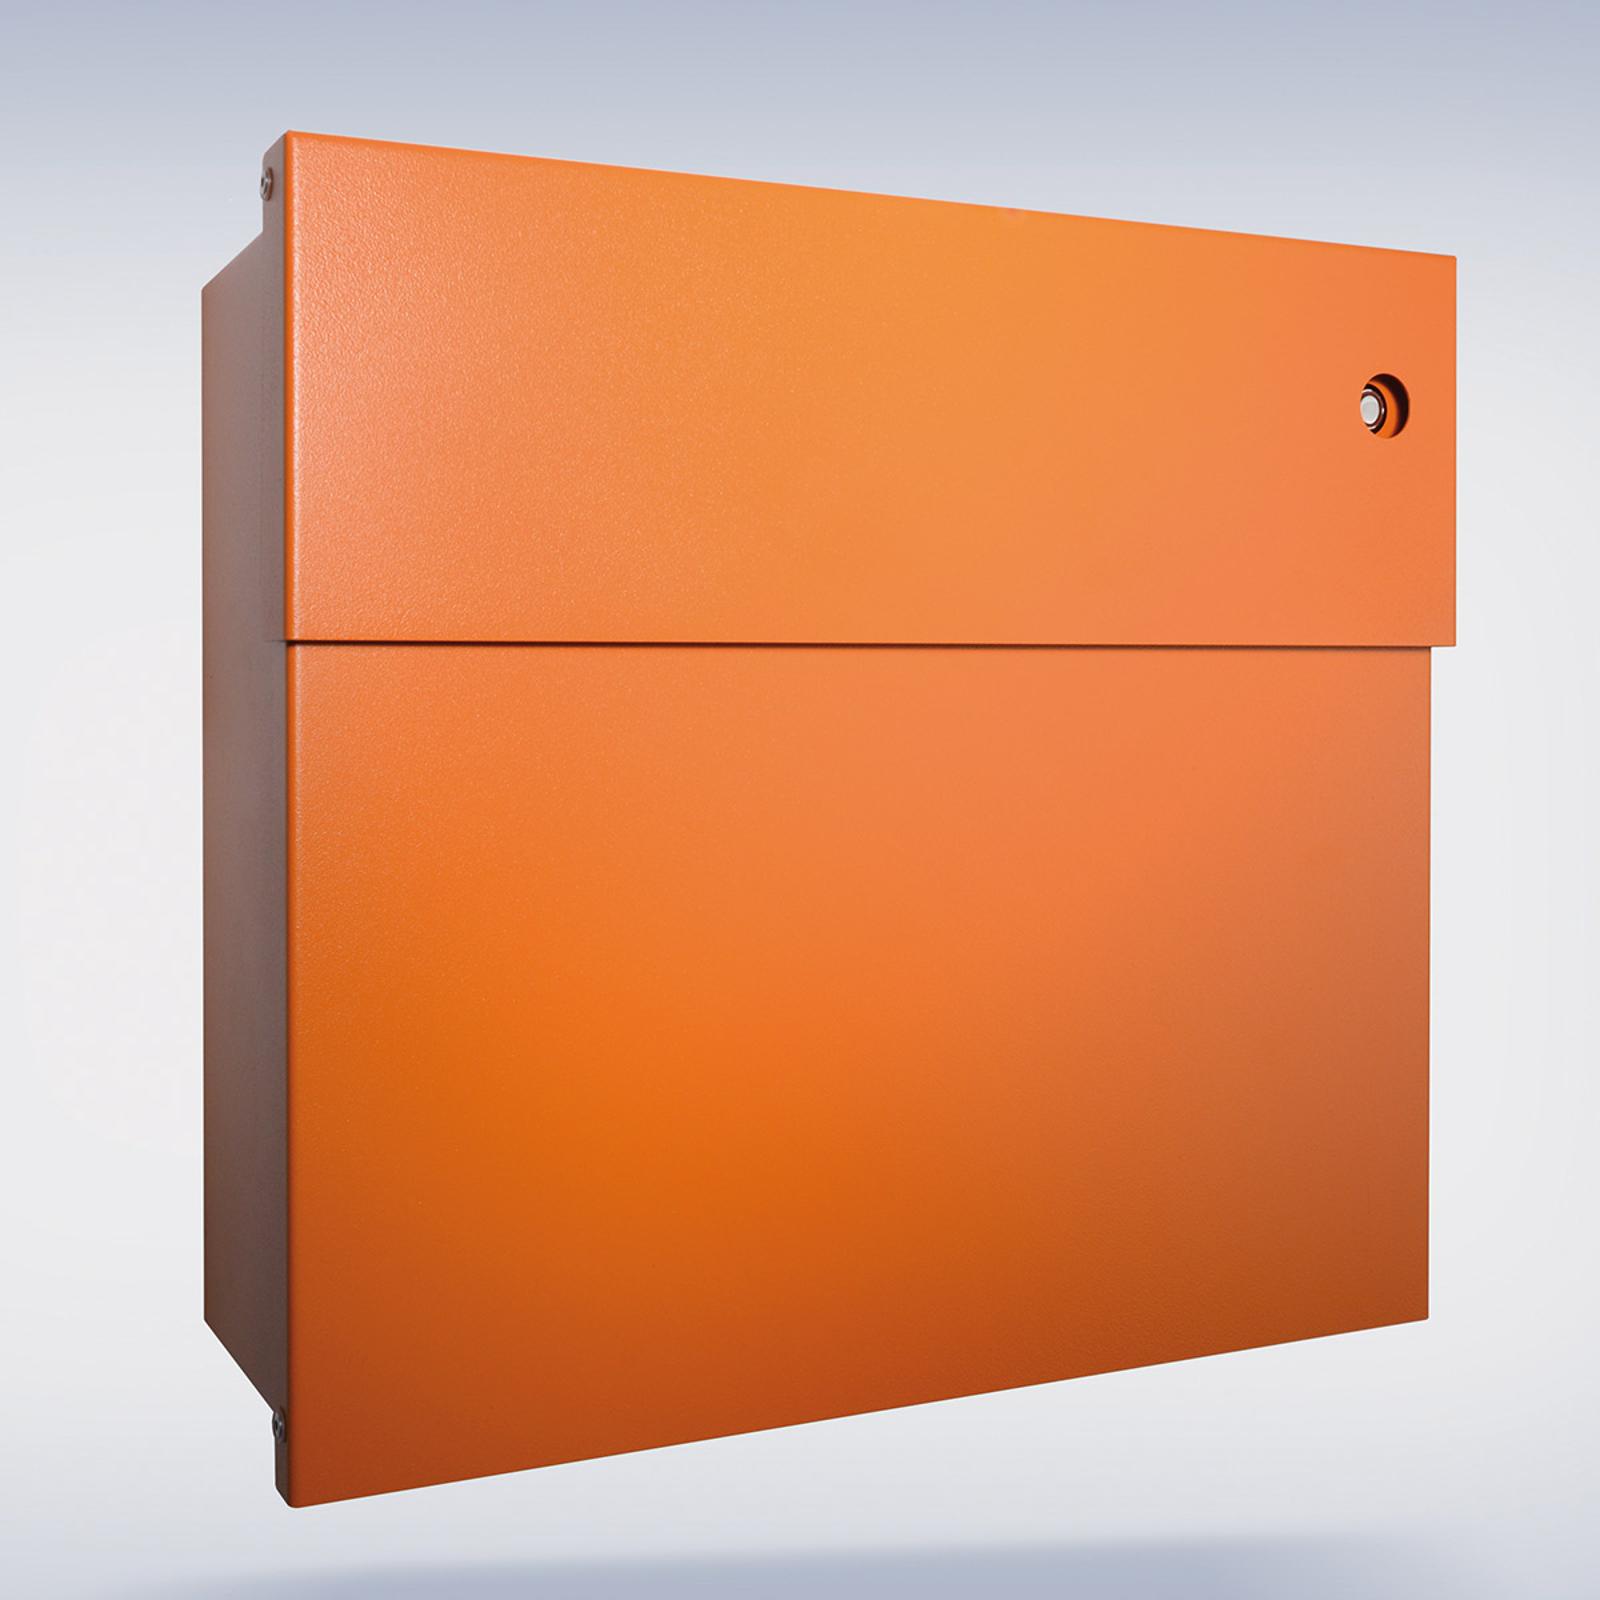 Boîte lettres Letterman IV, sonnette rouge, orange